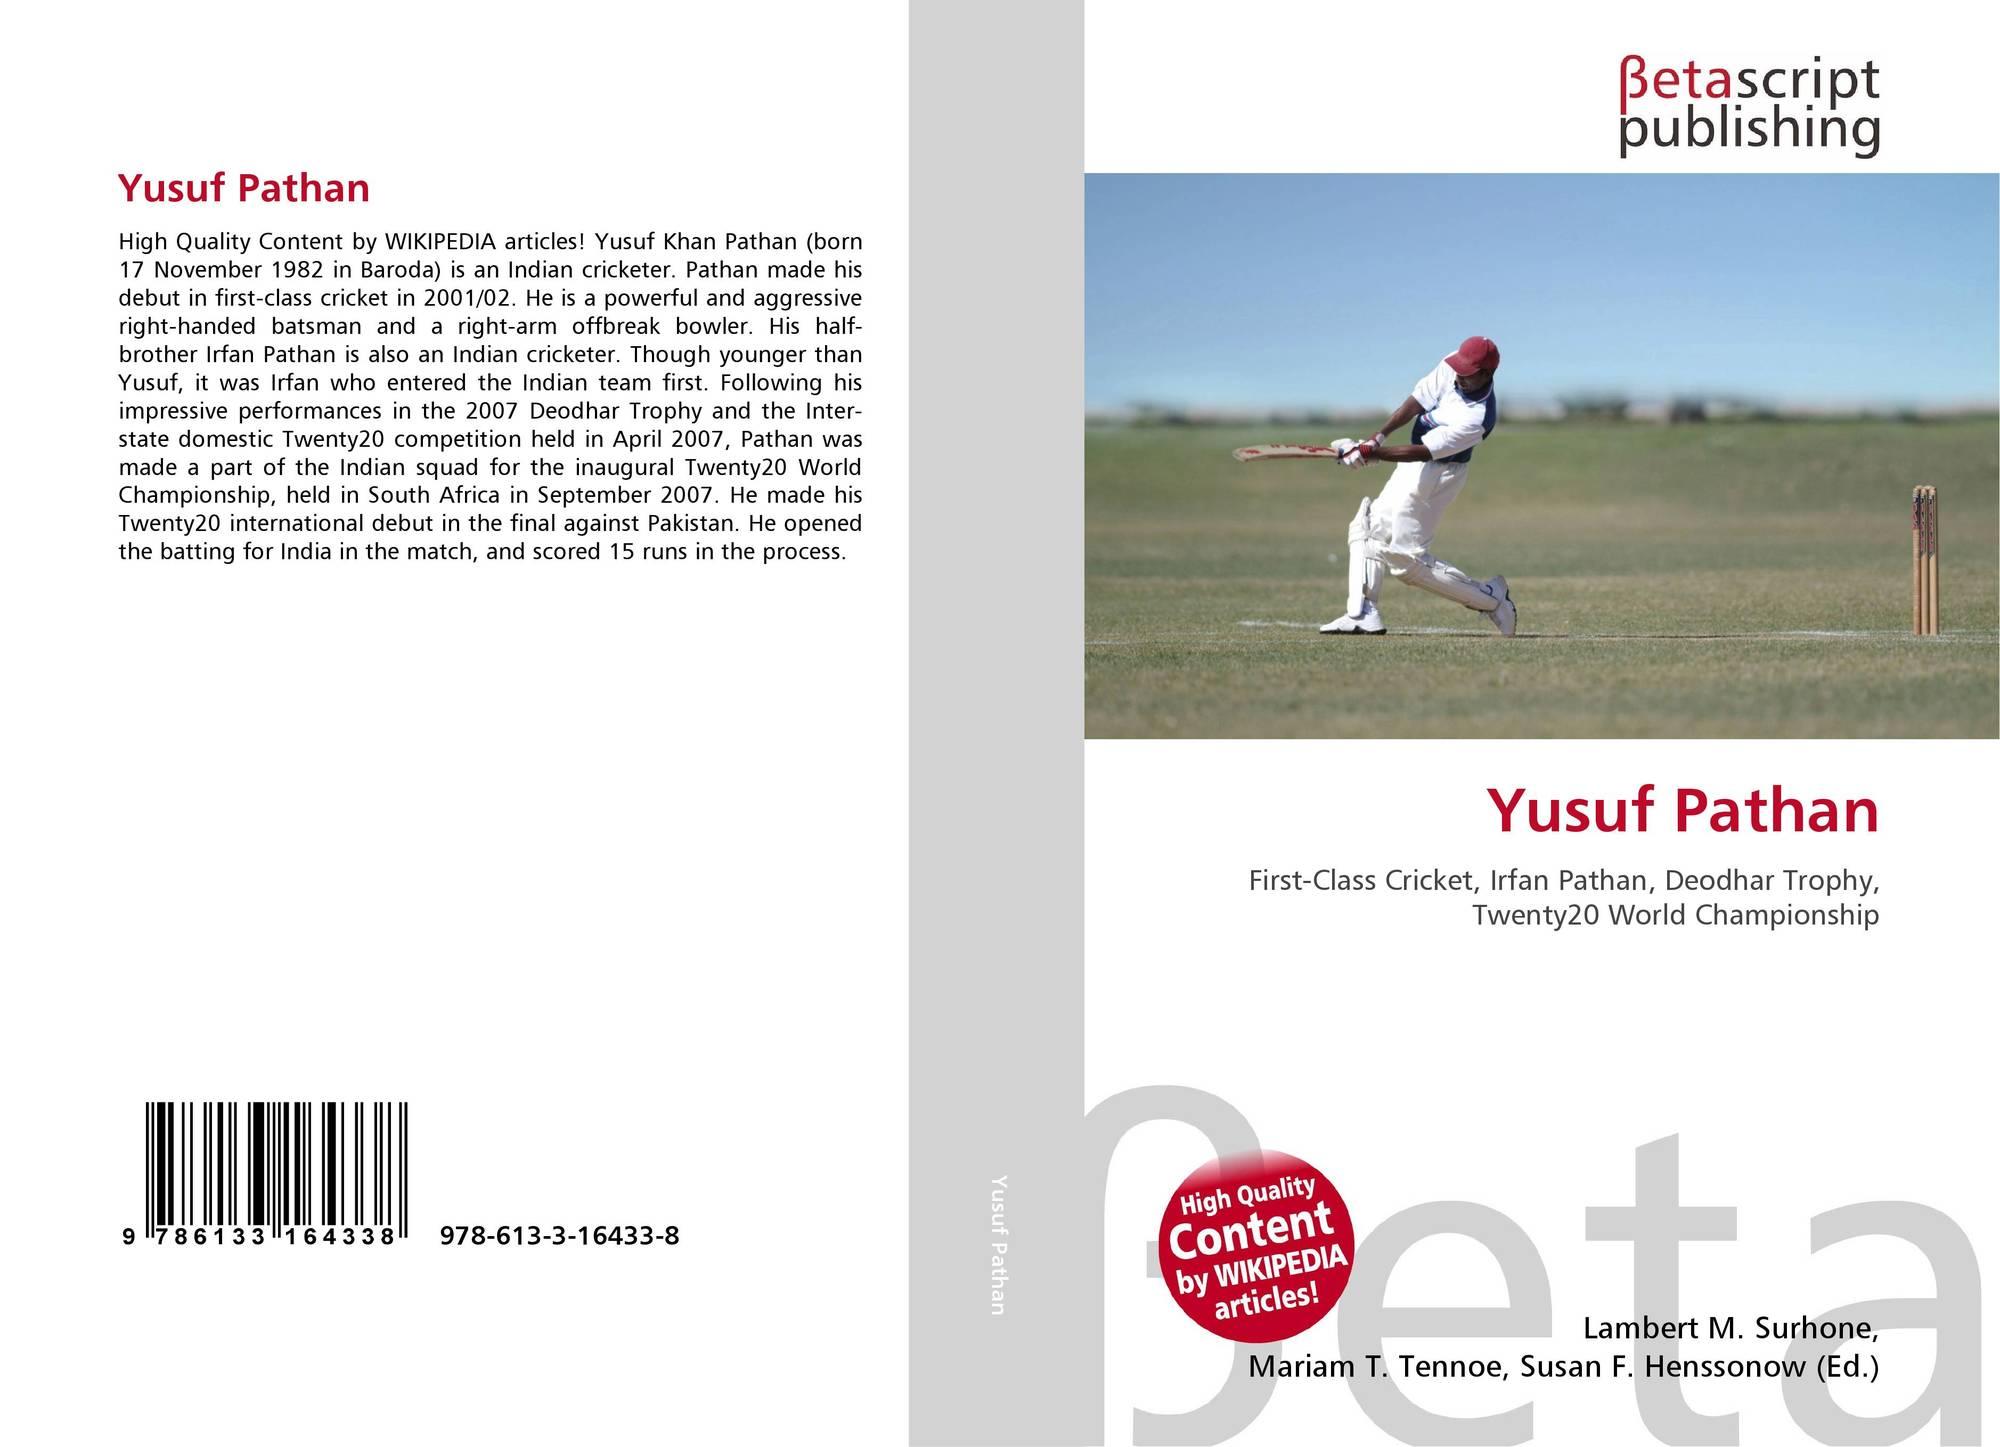 Yusuf Pathan, 978-613-3-16433-8, 6133164336 ,9786133164338